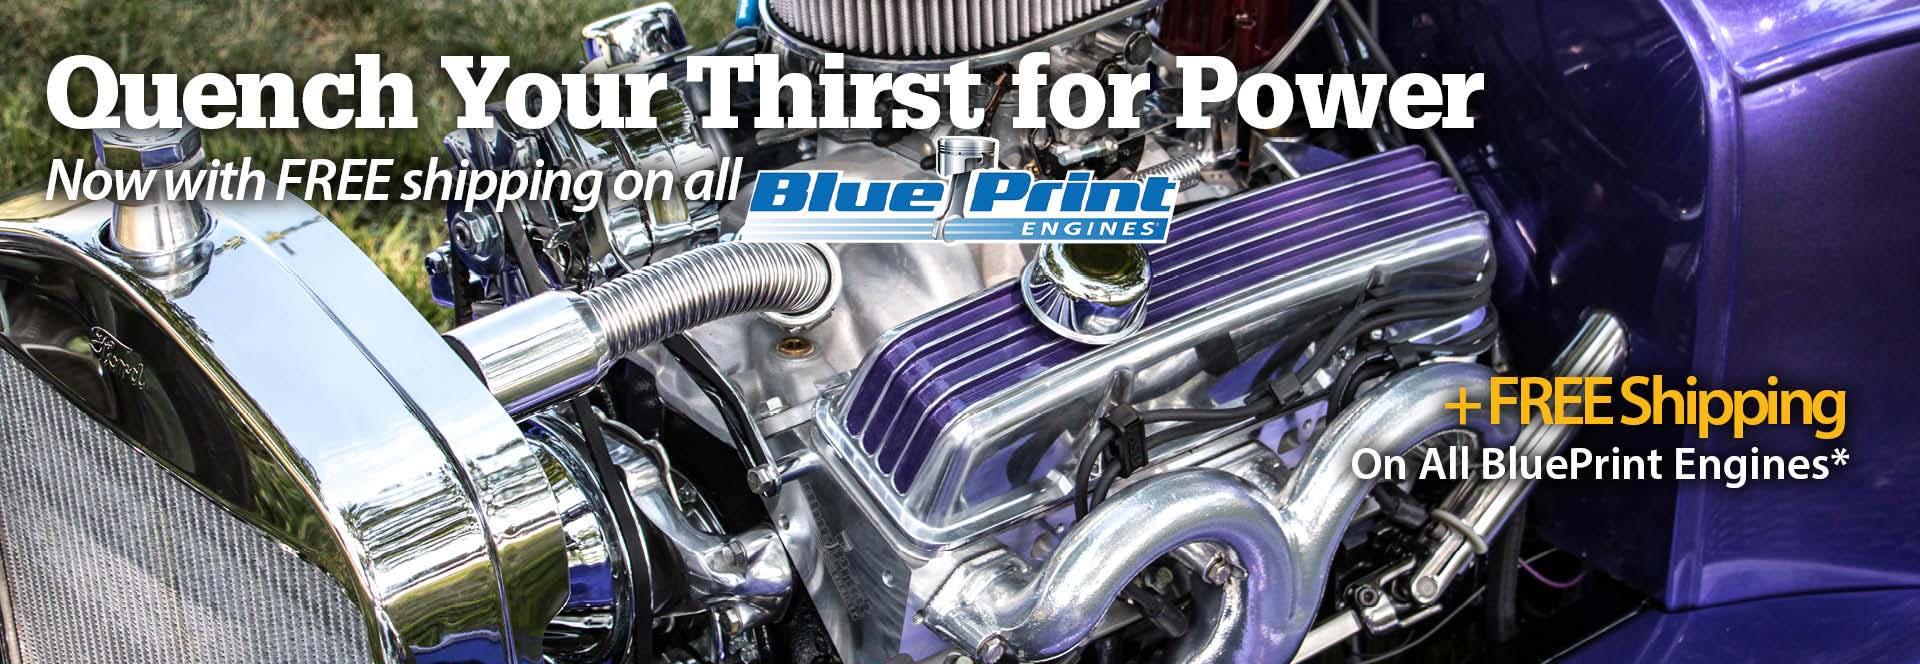 BluePrint Engines